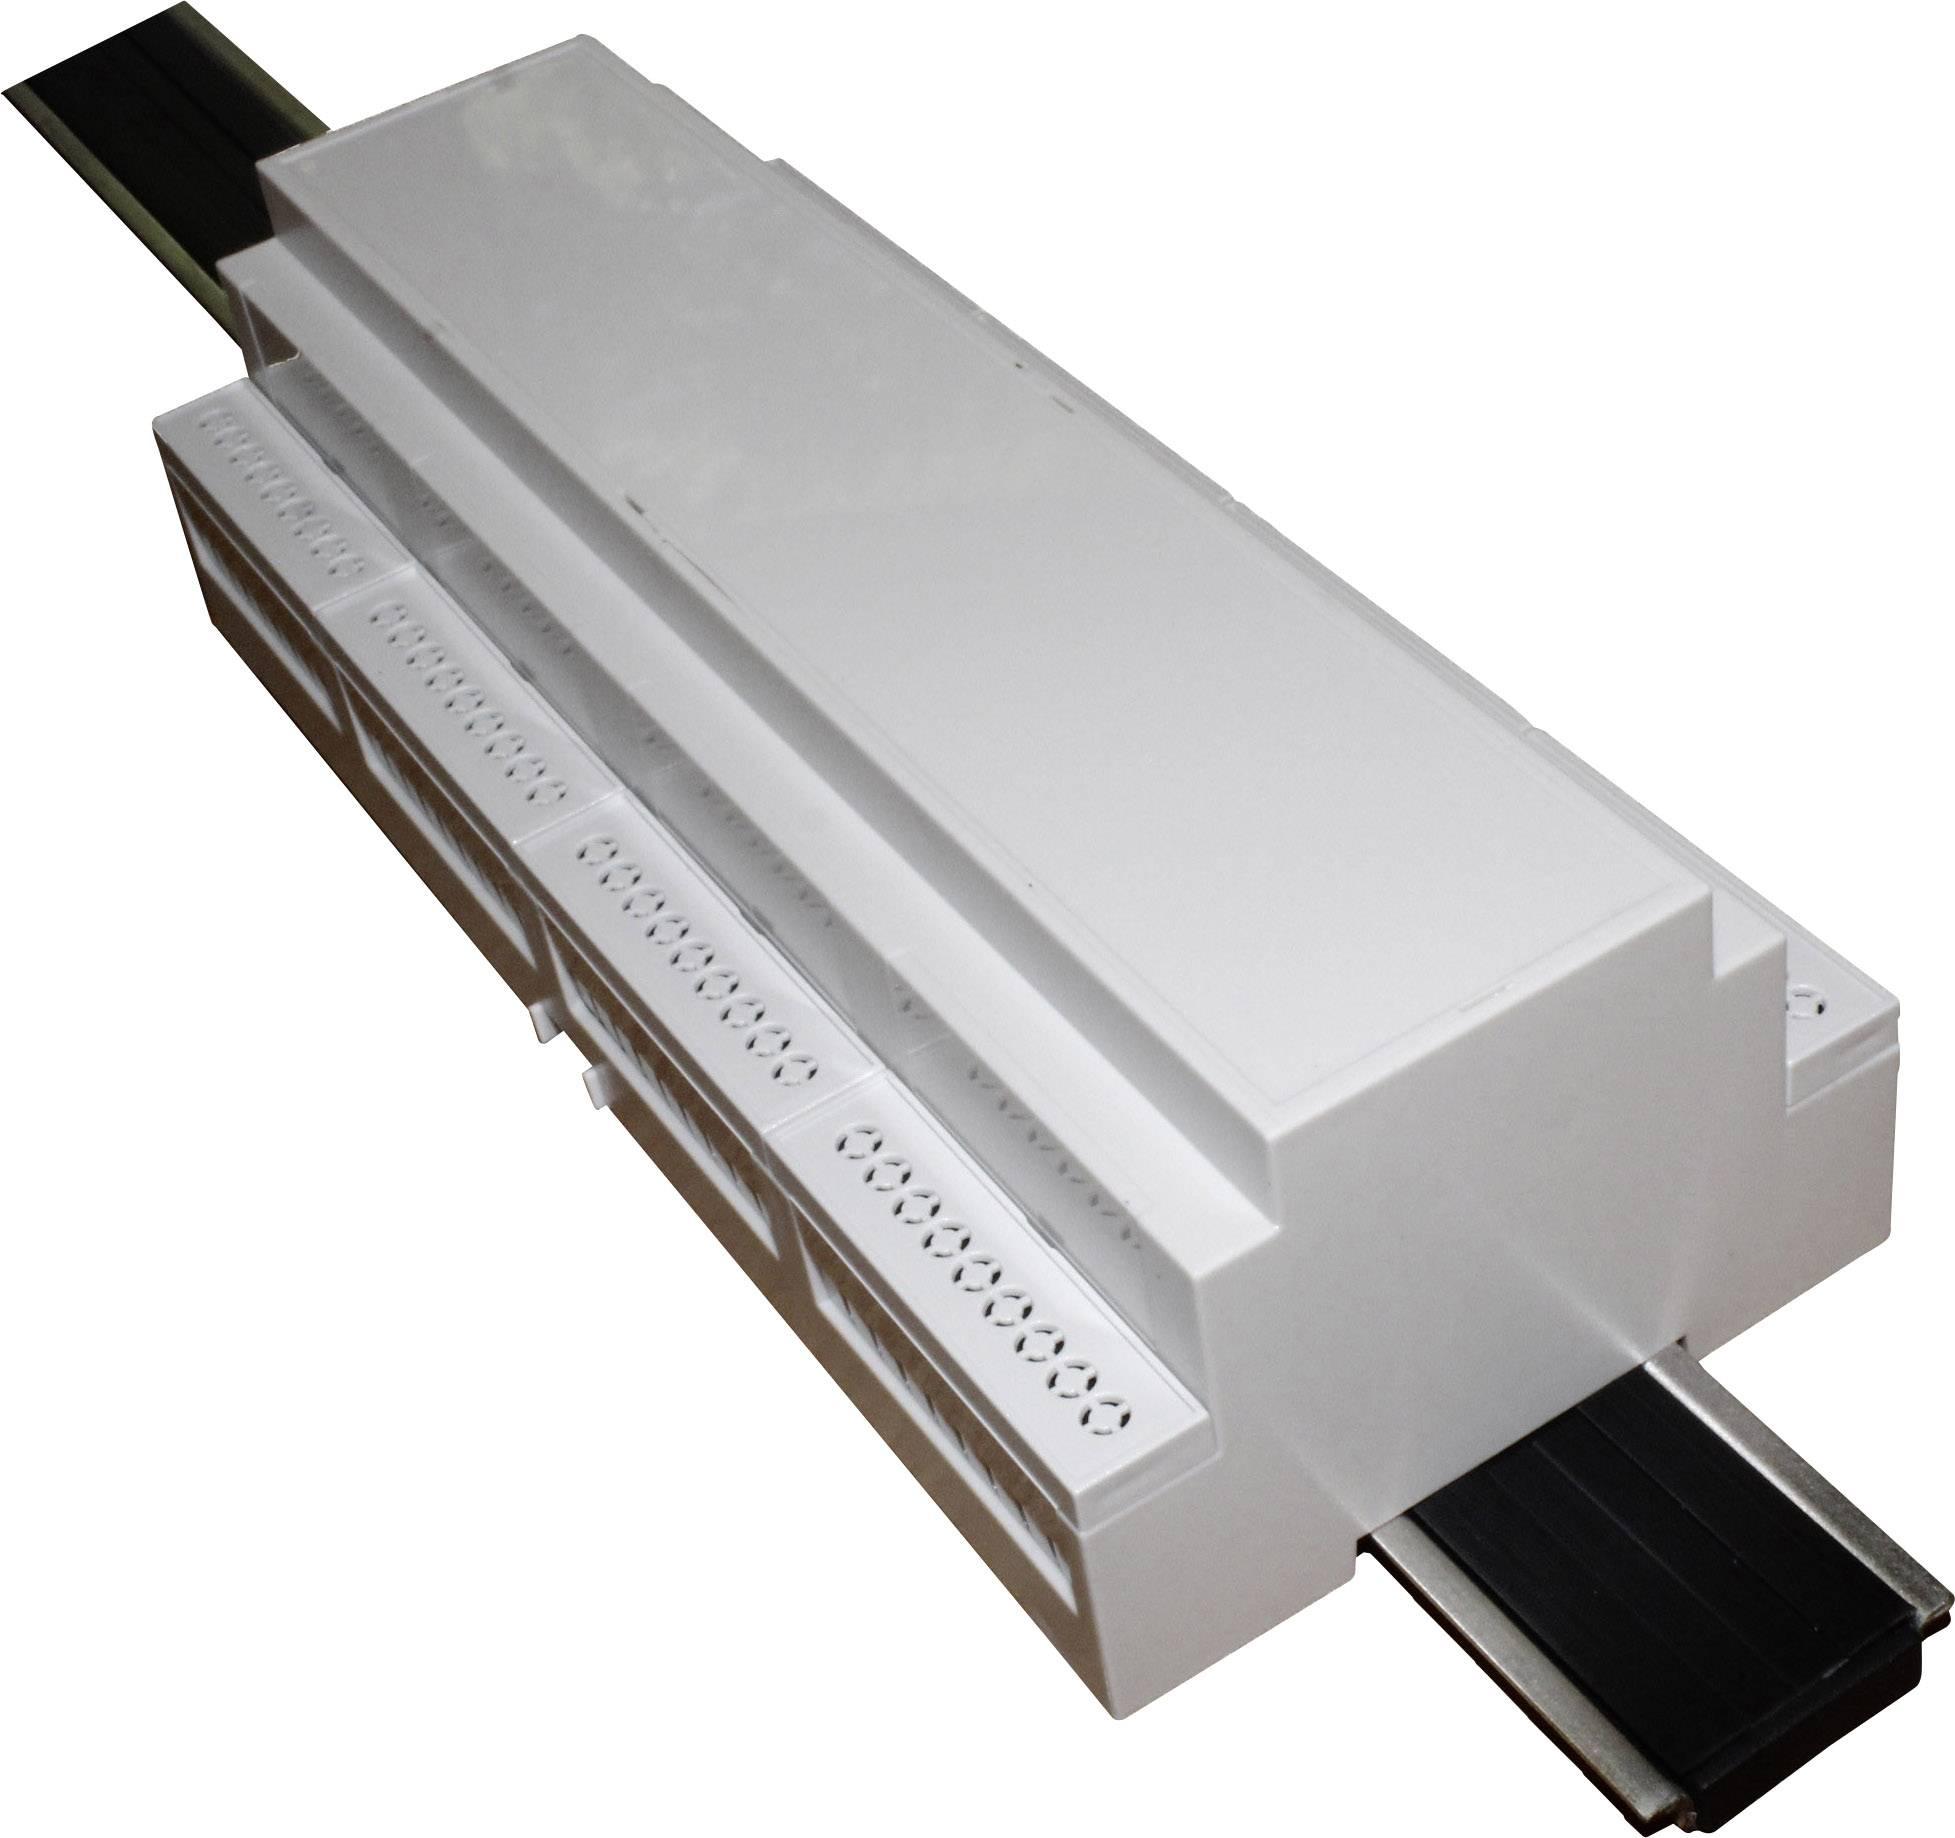 Pouzdro na DIN lištu Axxatronic CNMB/12/KIT/ACTIVE25-CON pro montáž na DIN lištu , 58 x 212 x 90 , polykarbonát, šedá, 1 ks